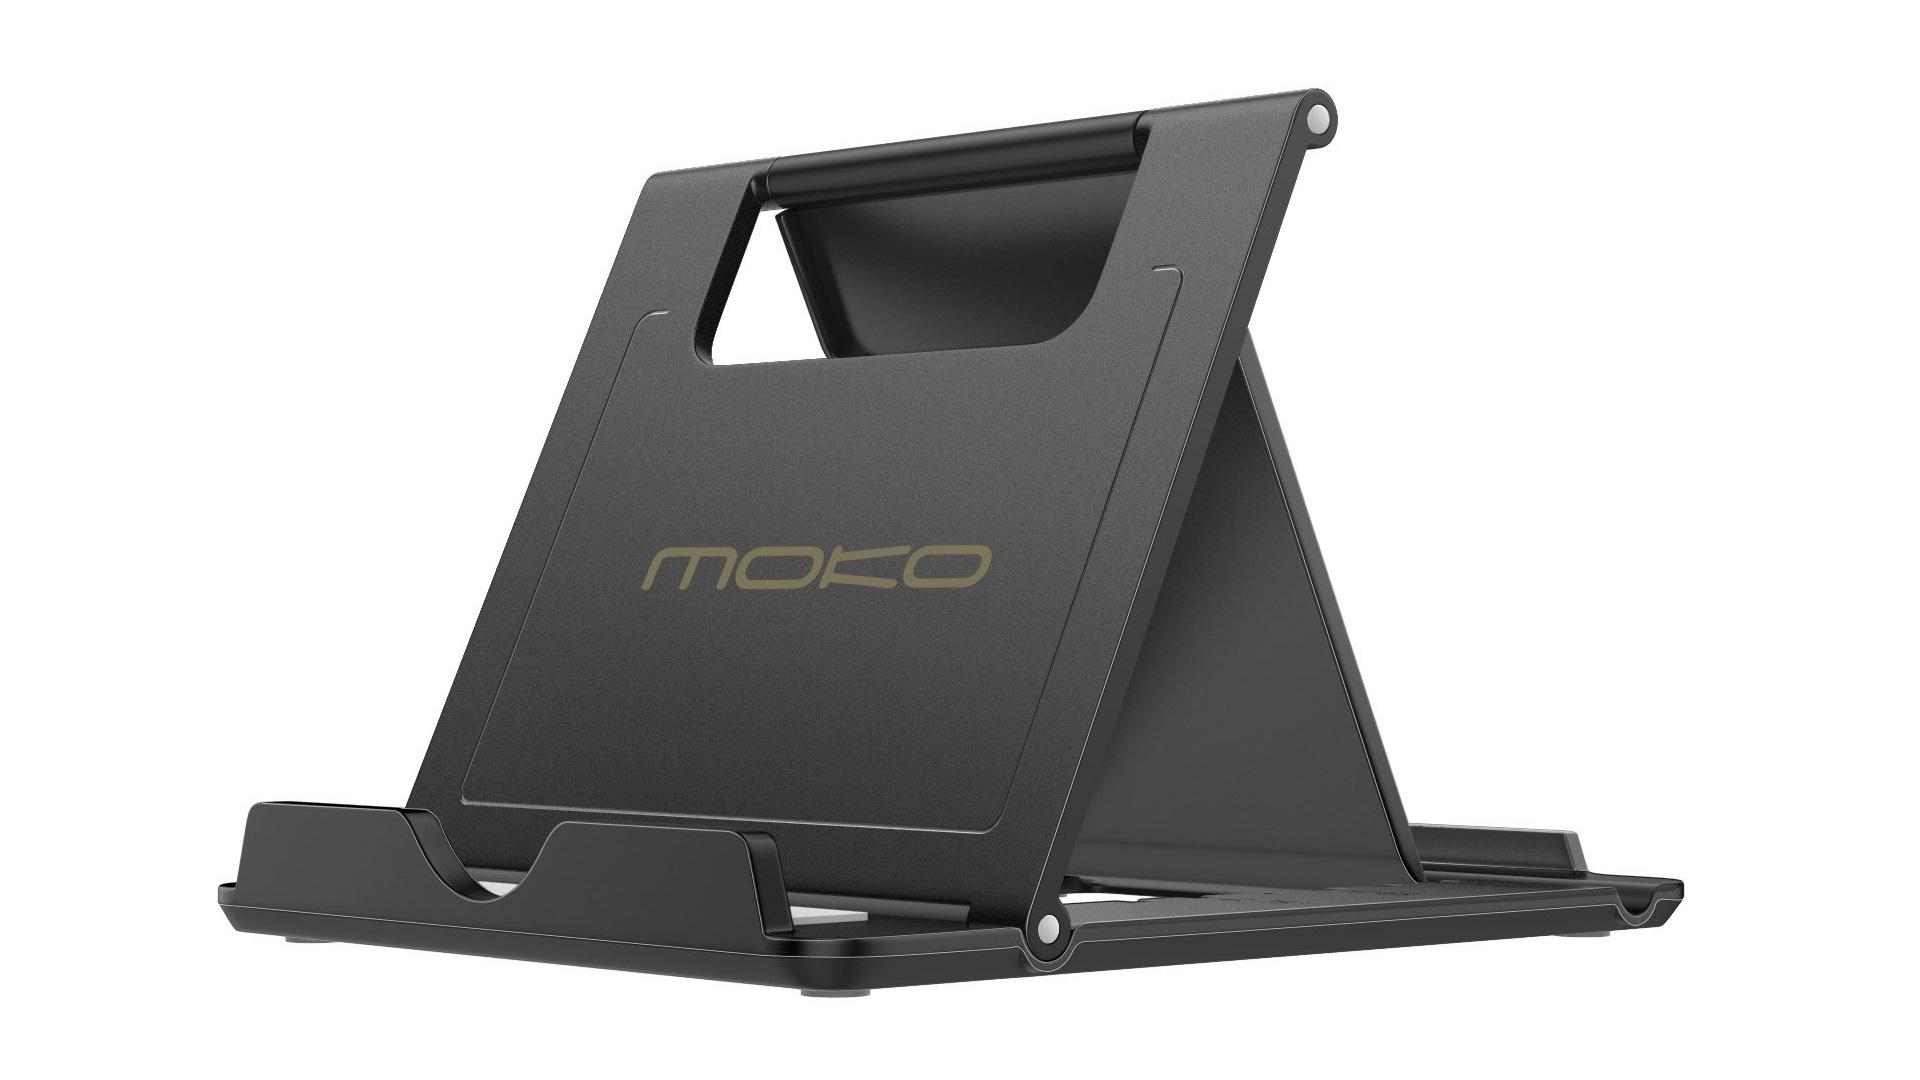 MoKo Foldable Multi Angle iPad Stand on a white background